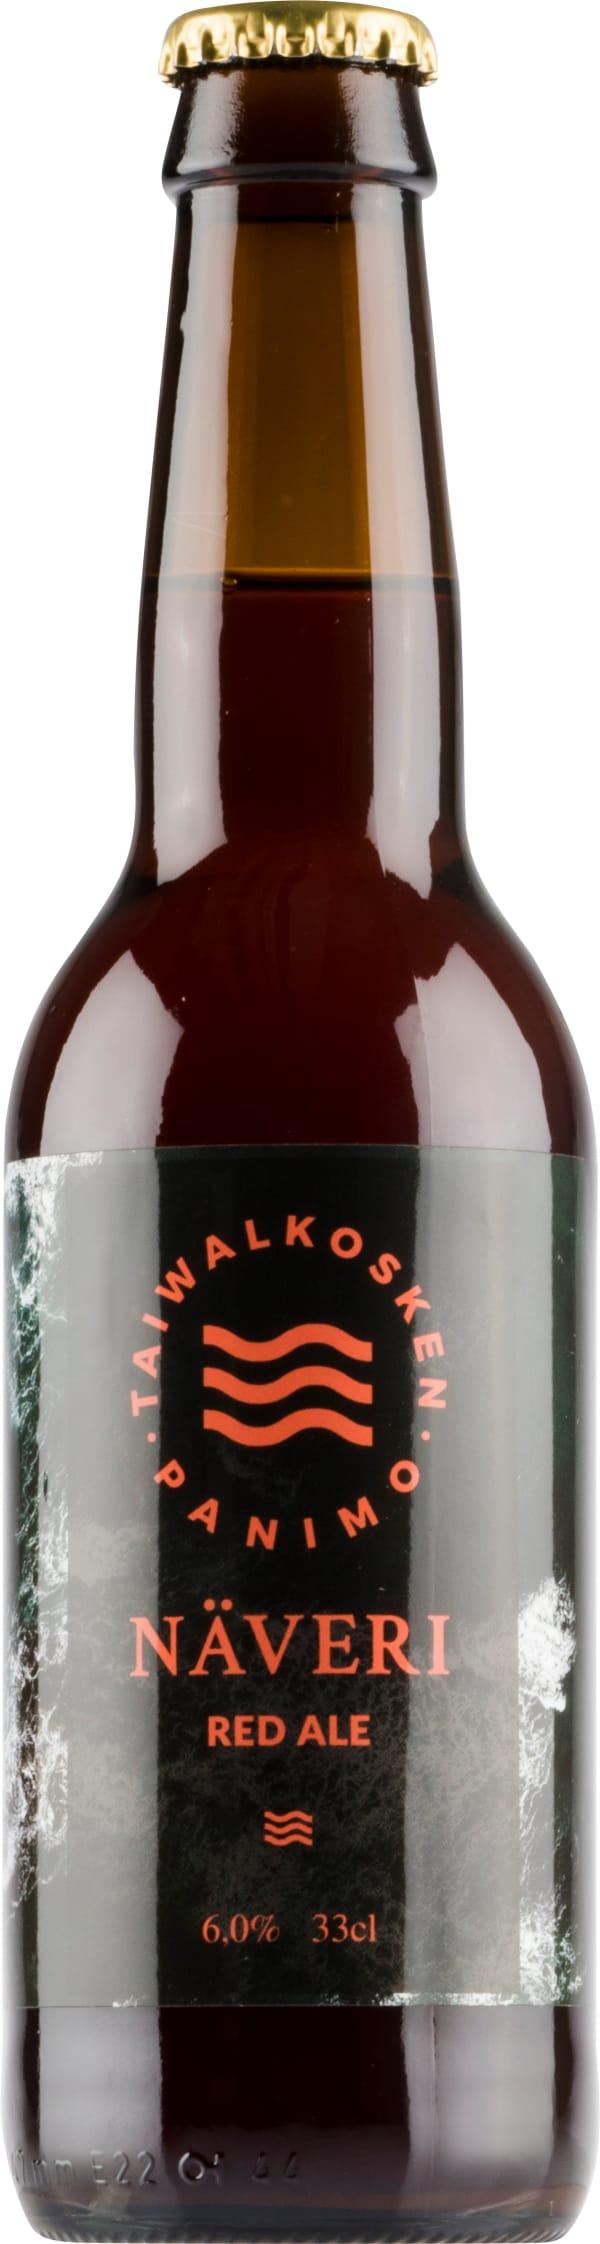 Taiwalkosken Näveri Red Ale